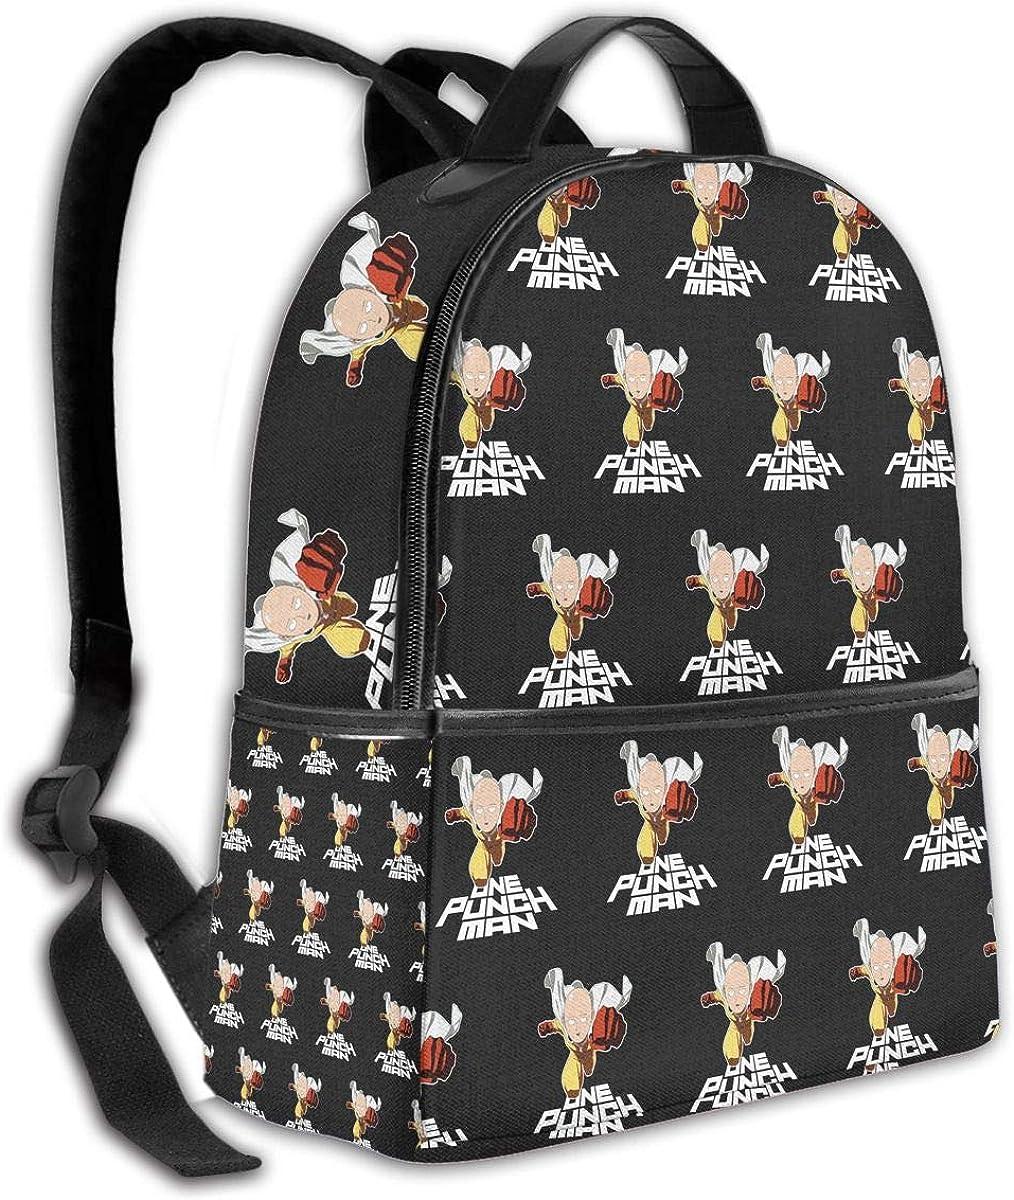 NanZYang School Backpack One Punch Man Ok Saitama Unisex Daypacks Laptop Bags Outdoor Travel Large Computer Bag Black